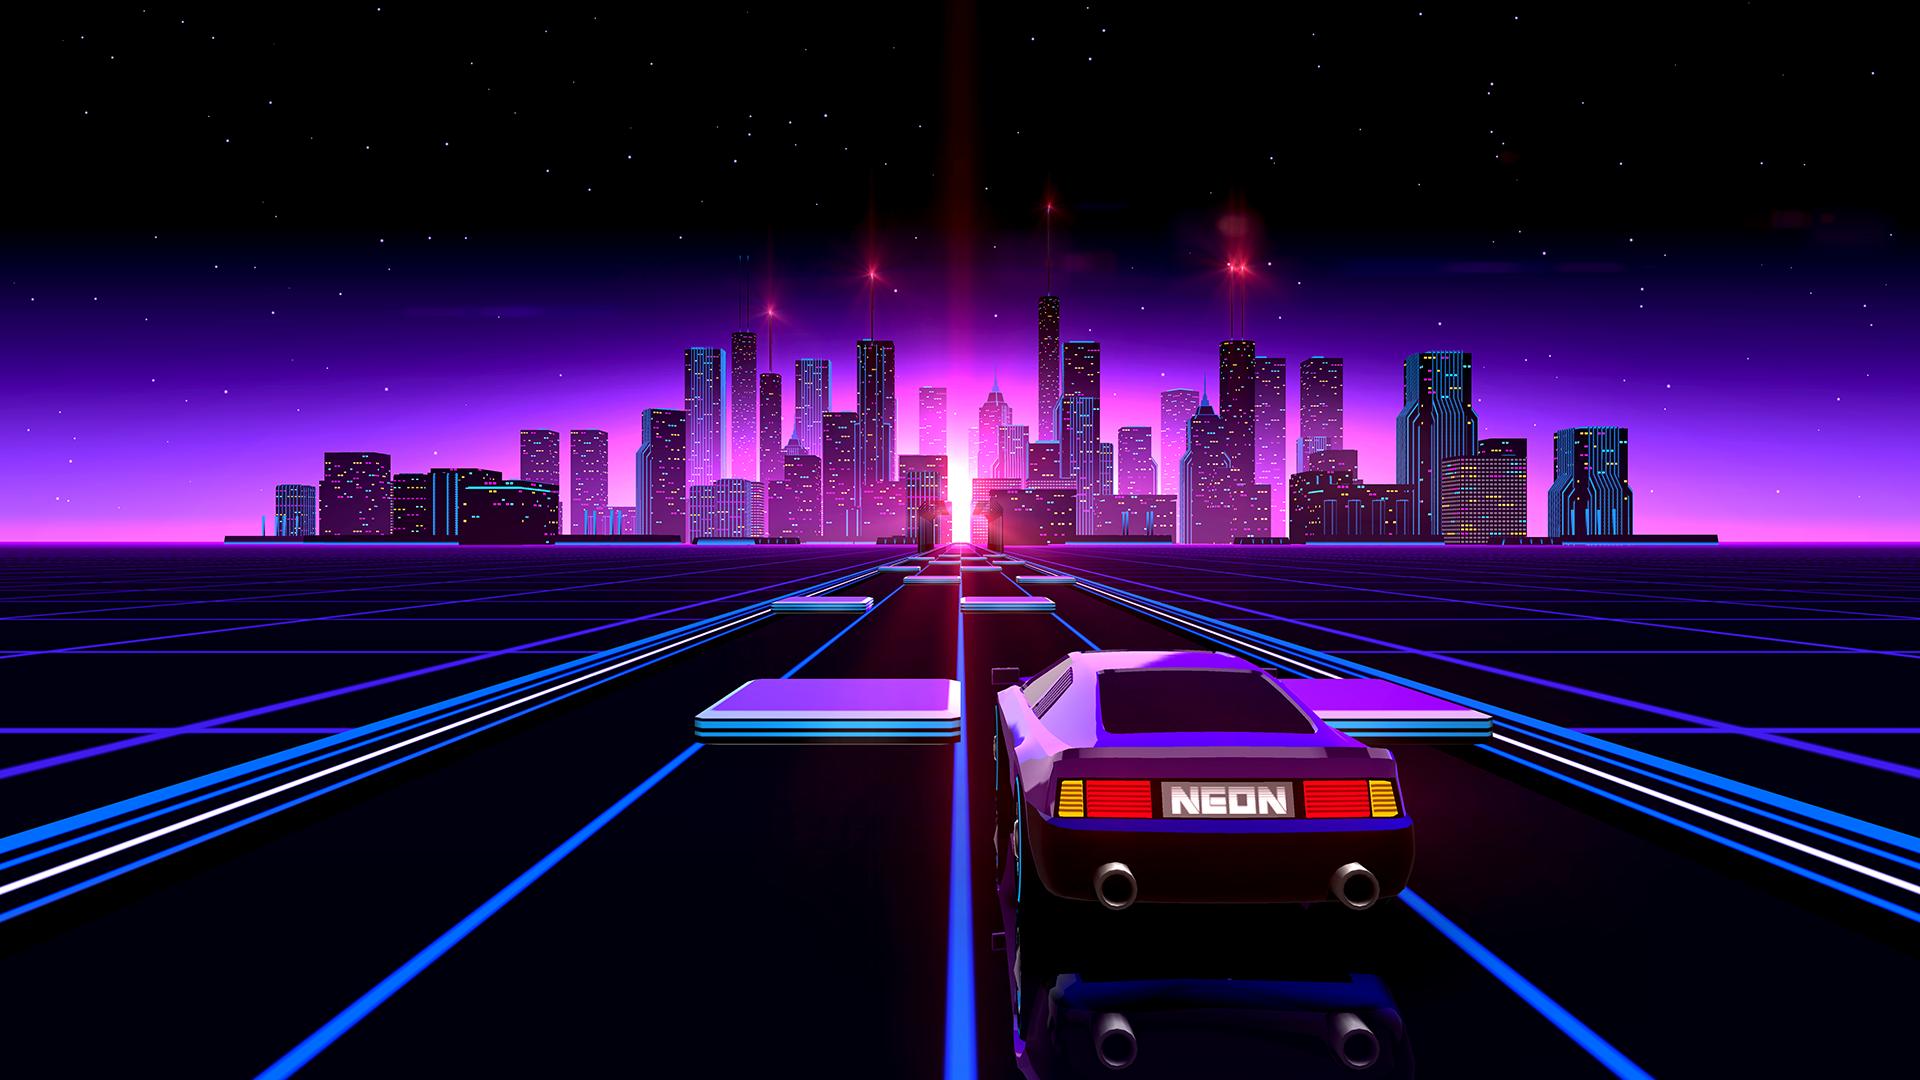 Neon Drive City Image Indie Db